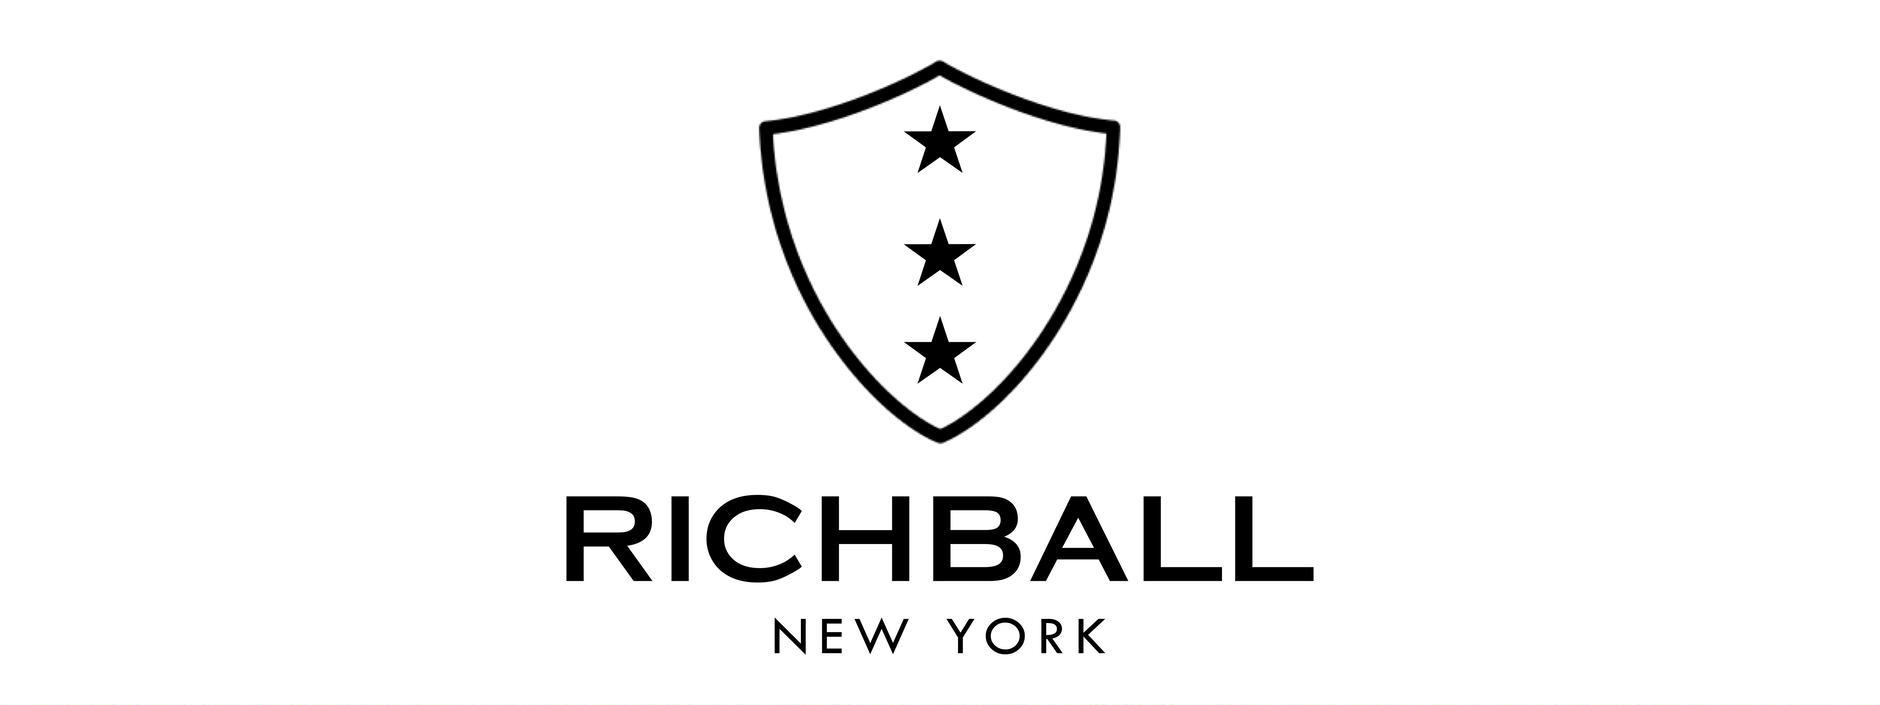 RICHBALL